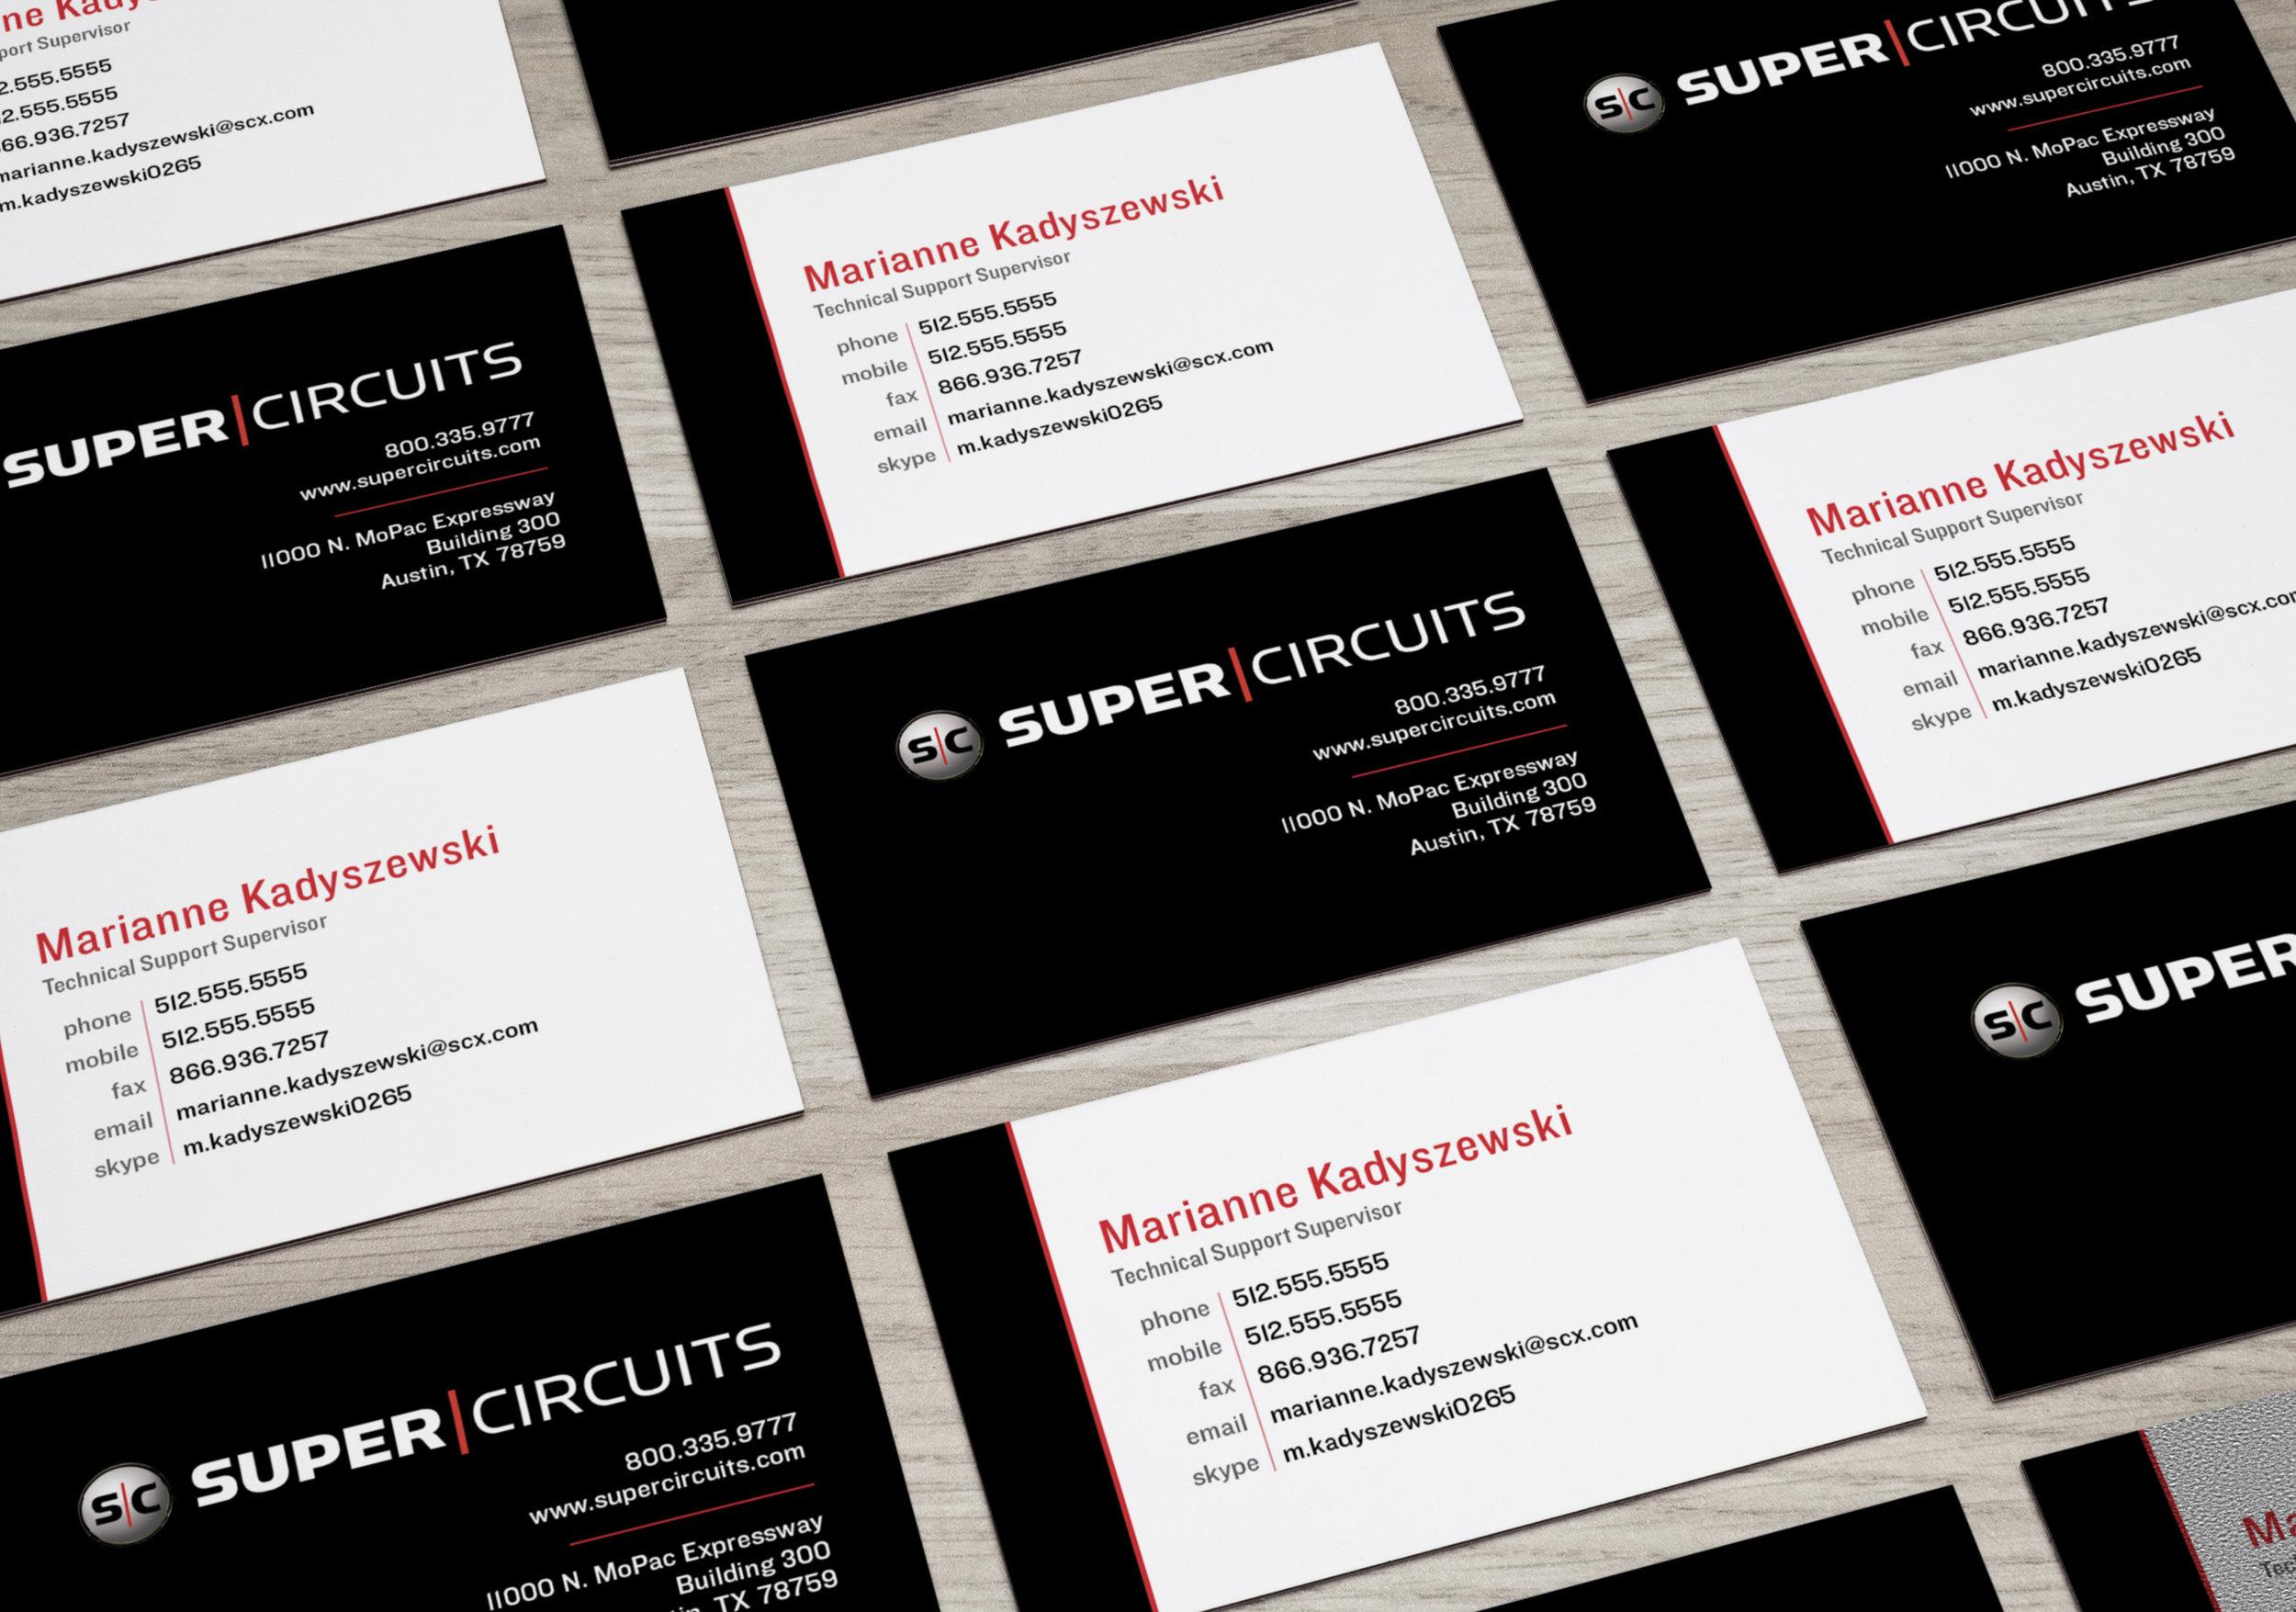 Supercircuits Business Card Refresh - Branding Materials